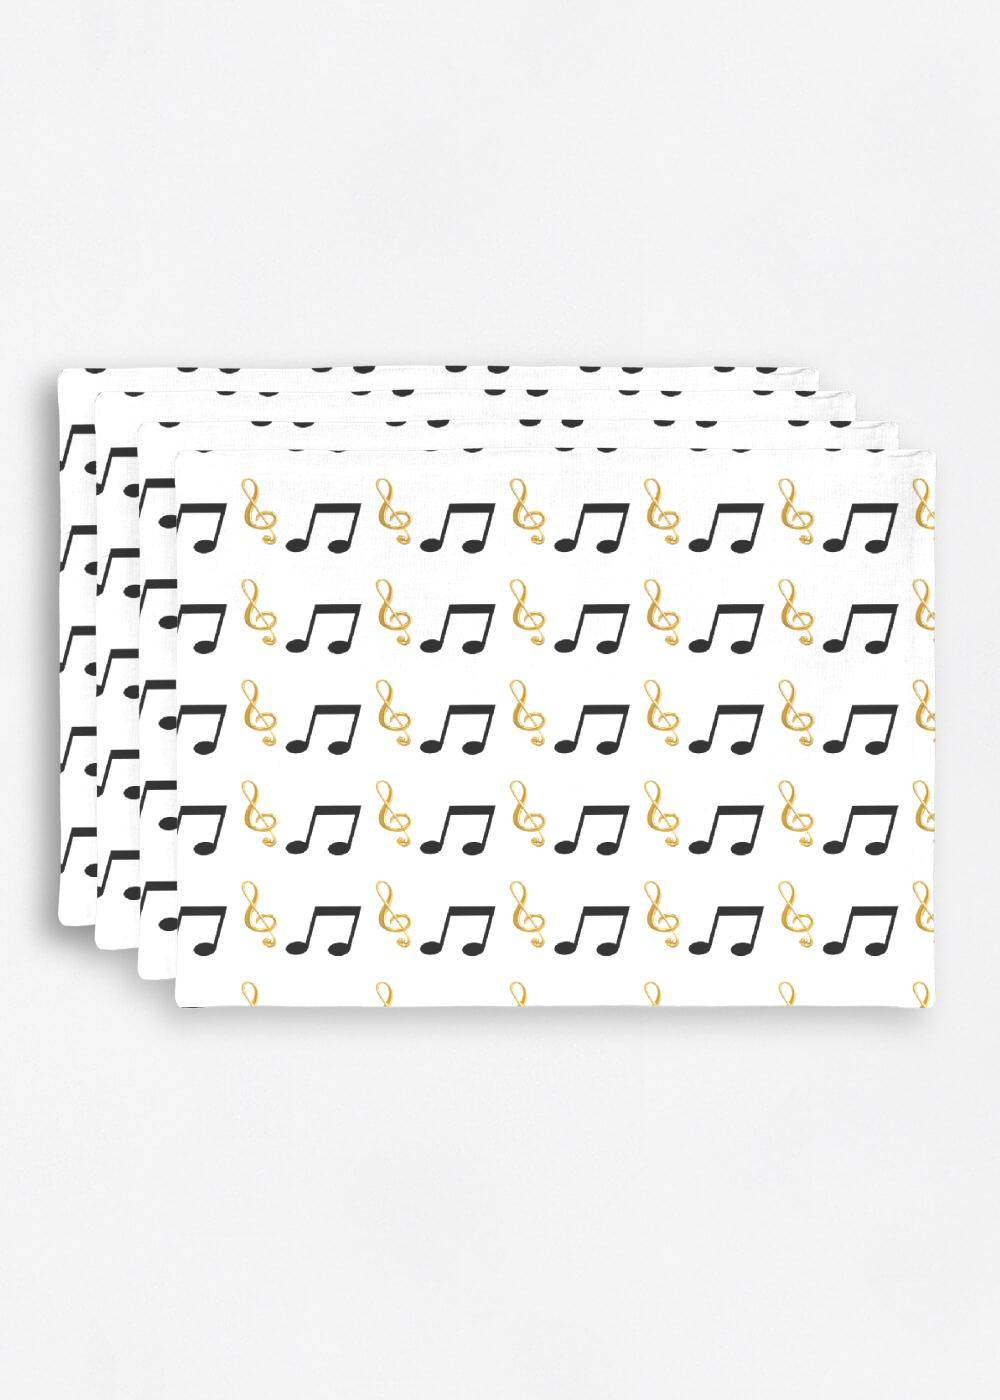 VIDA Placemat Set - Digital Music by VIDA Original Artist  - Size: Set of 4